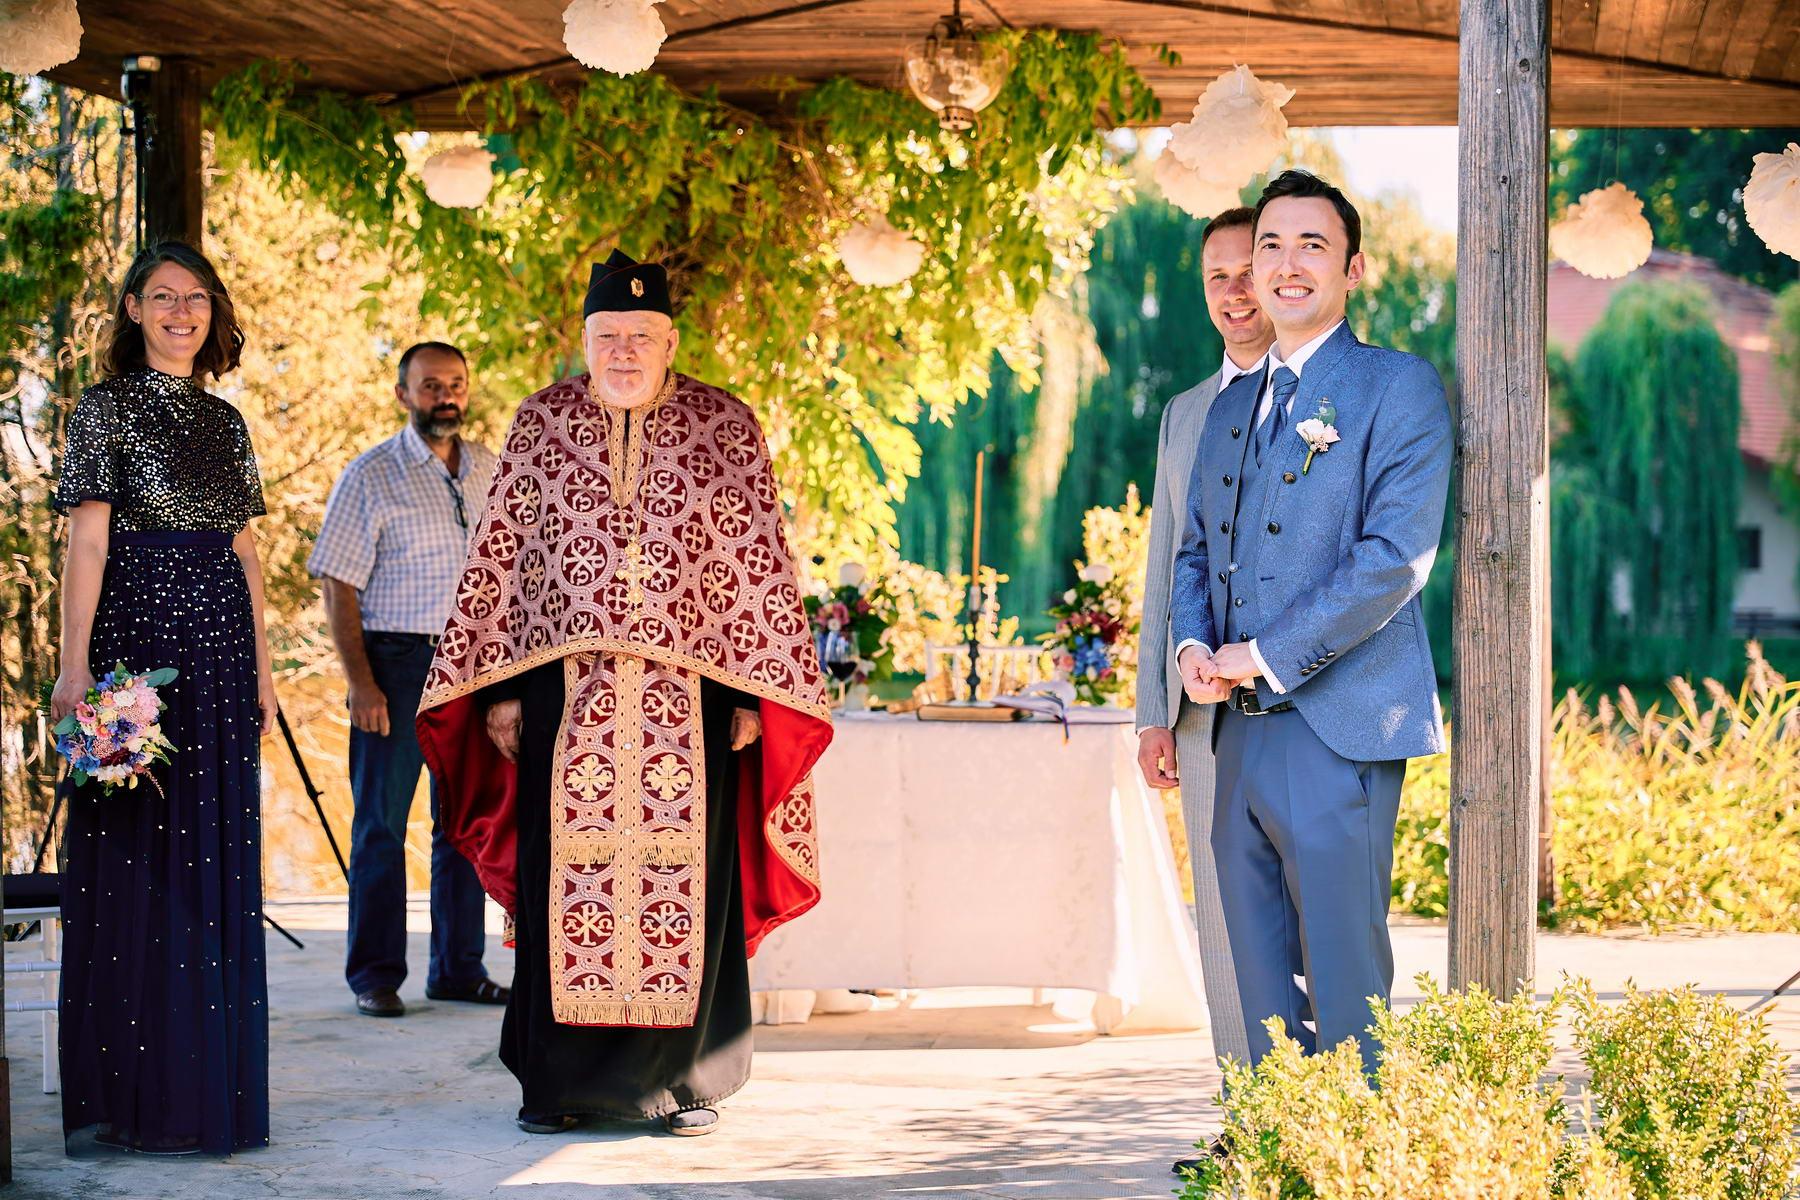 Fotografii Cununie Religioasa In Aer Liber Yaz Harman 4